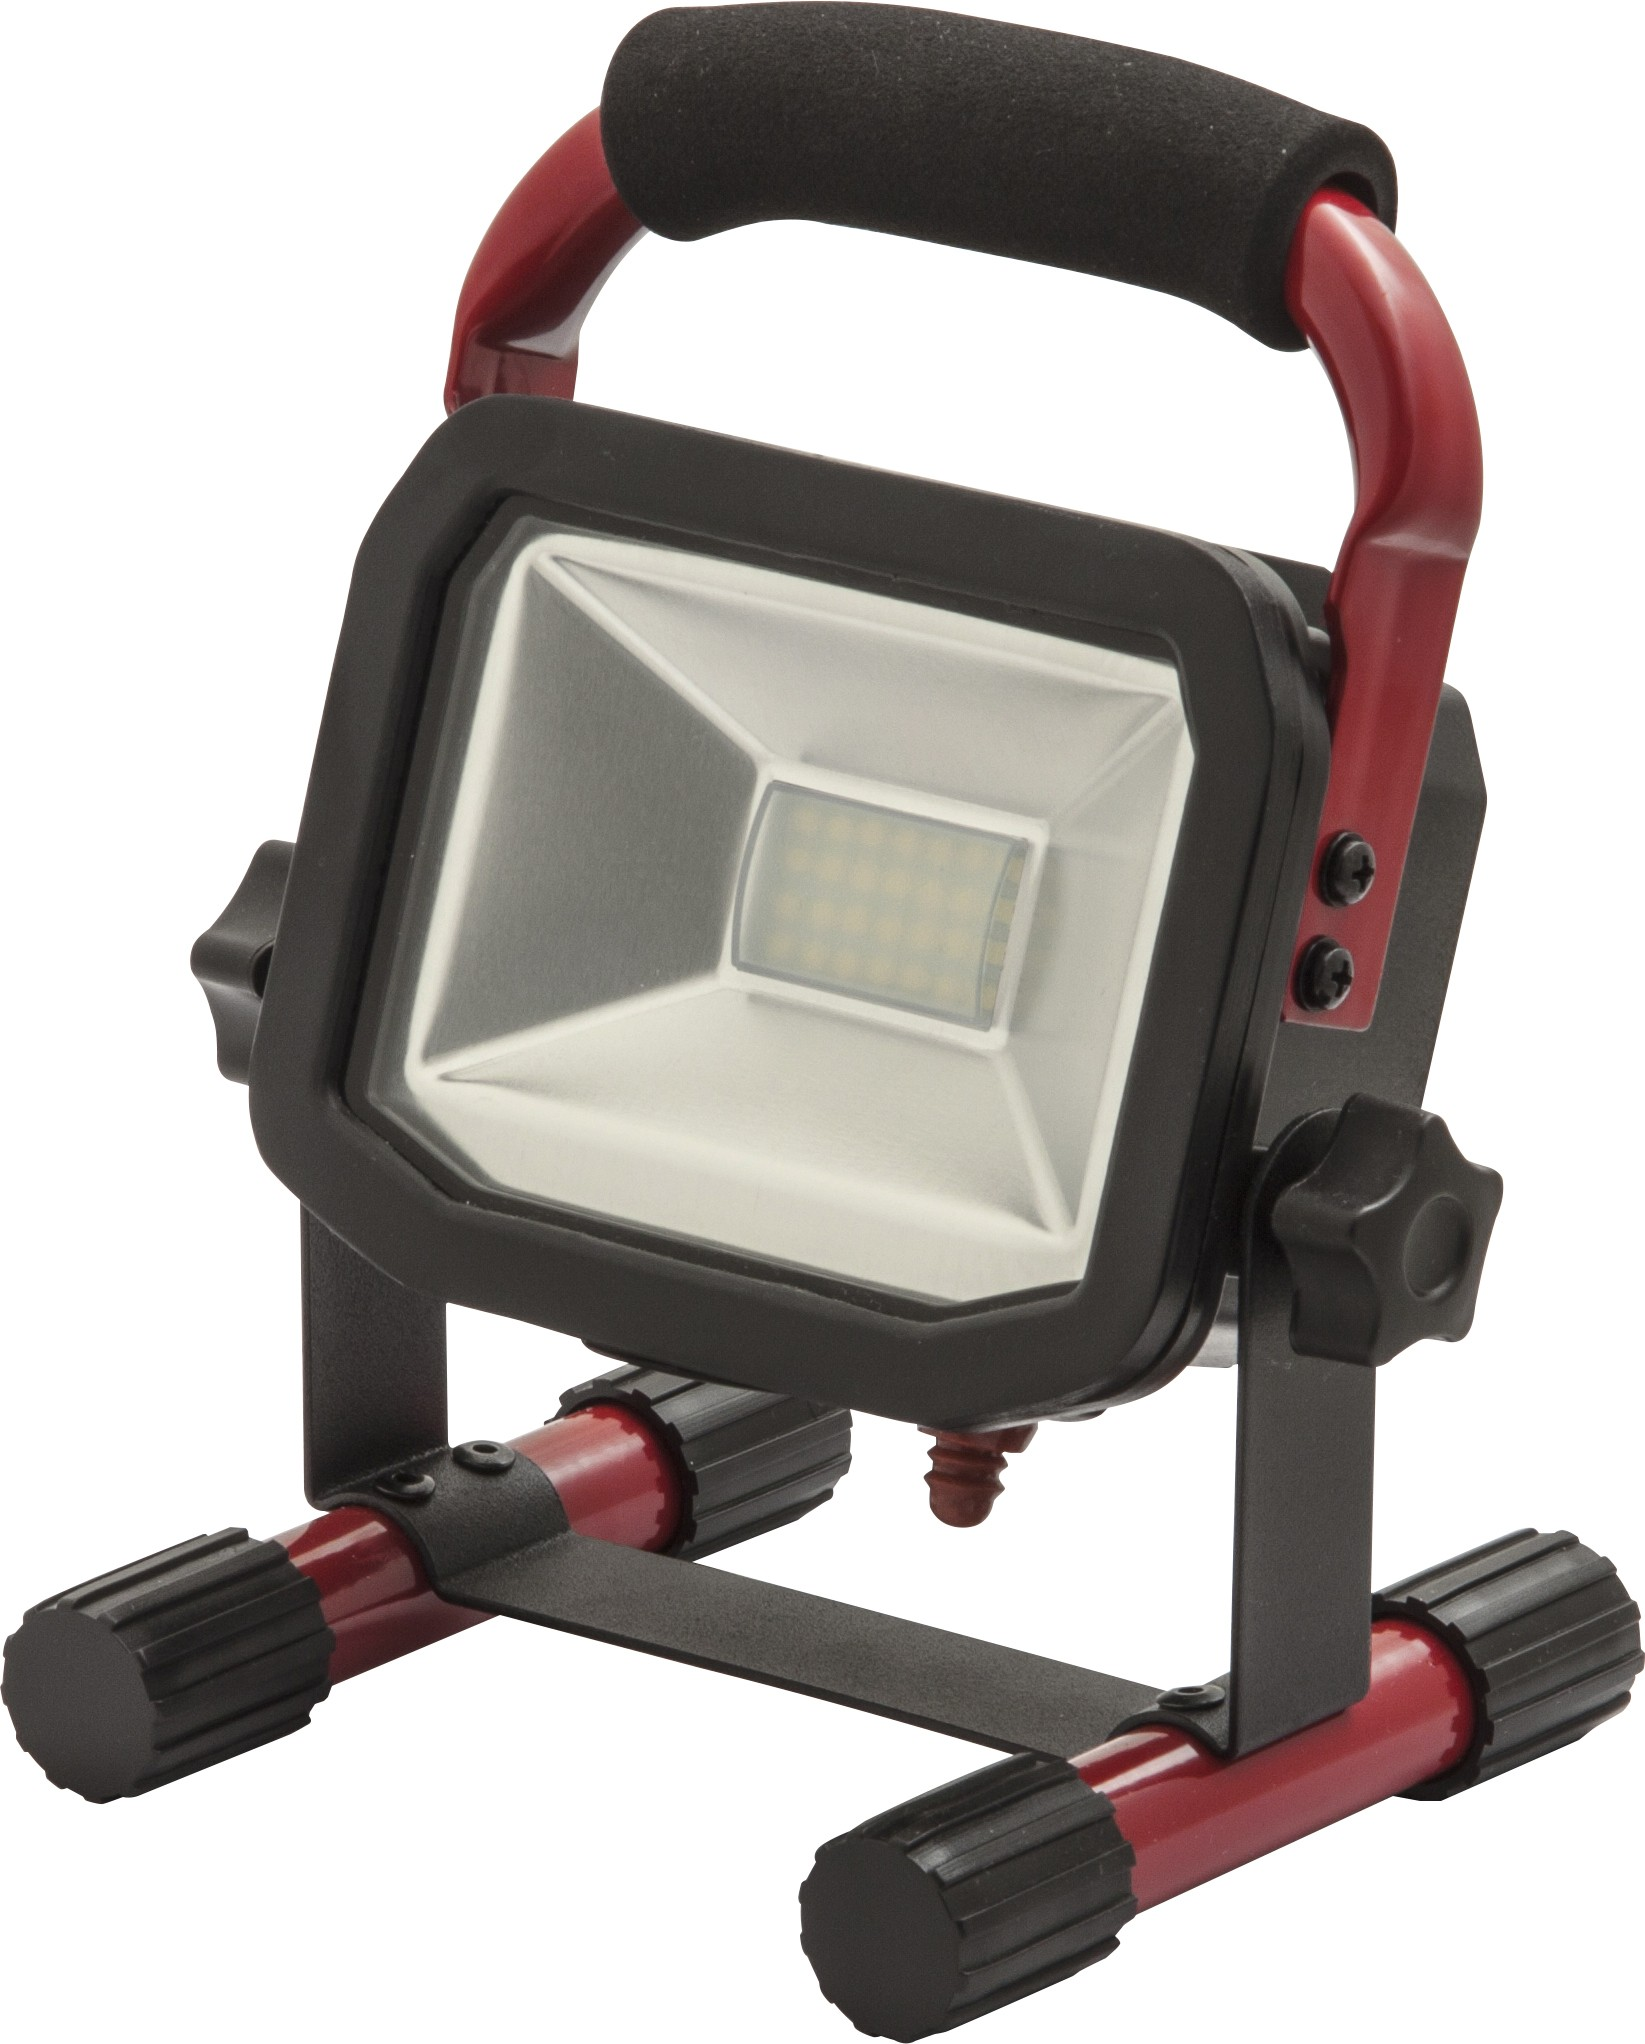 10w cob led usb rechargeable work light. Black Bedroom Furniture Sets. Home Design Ideas